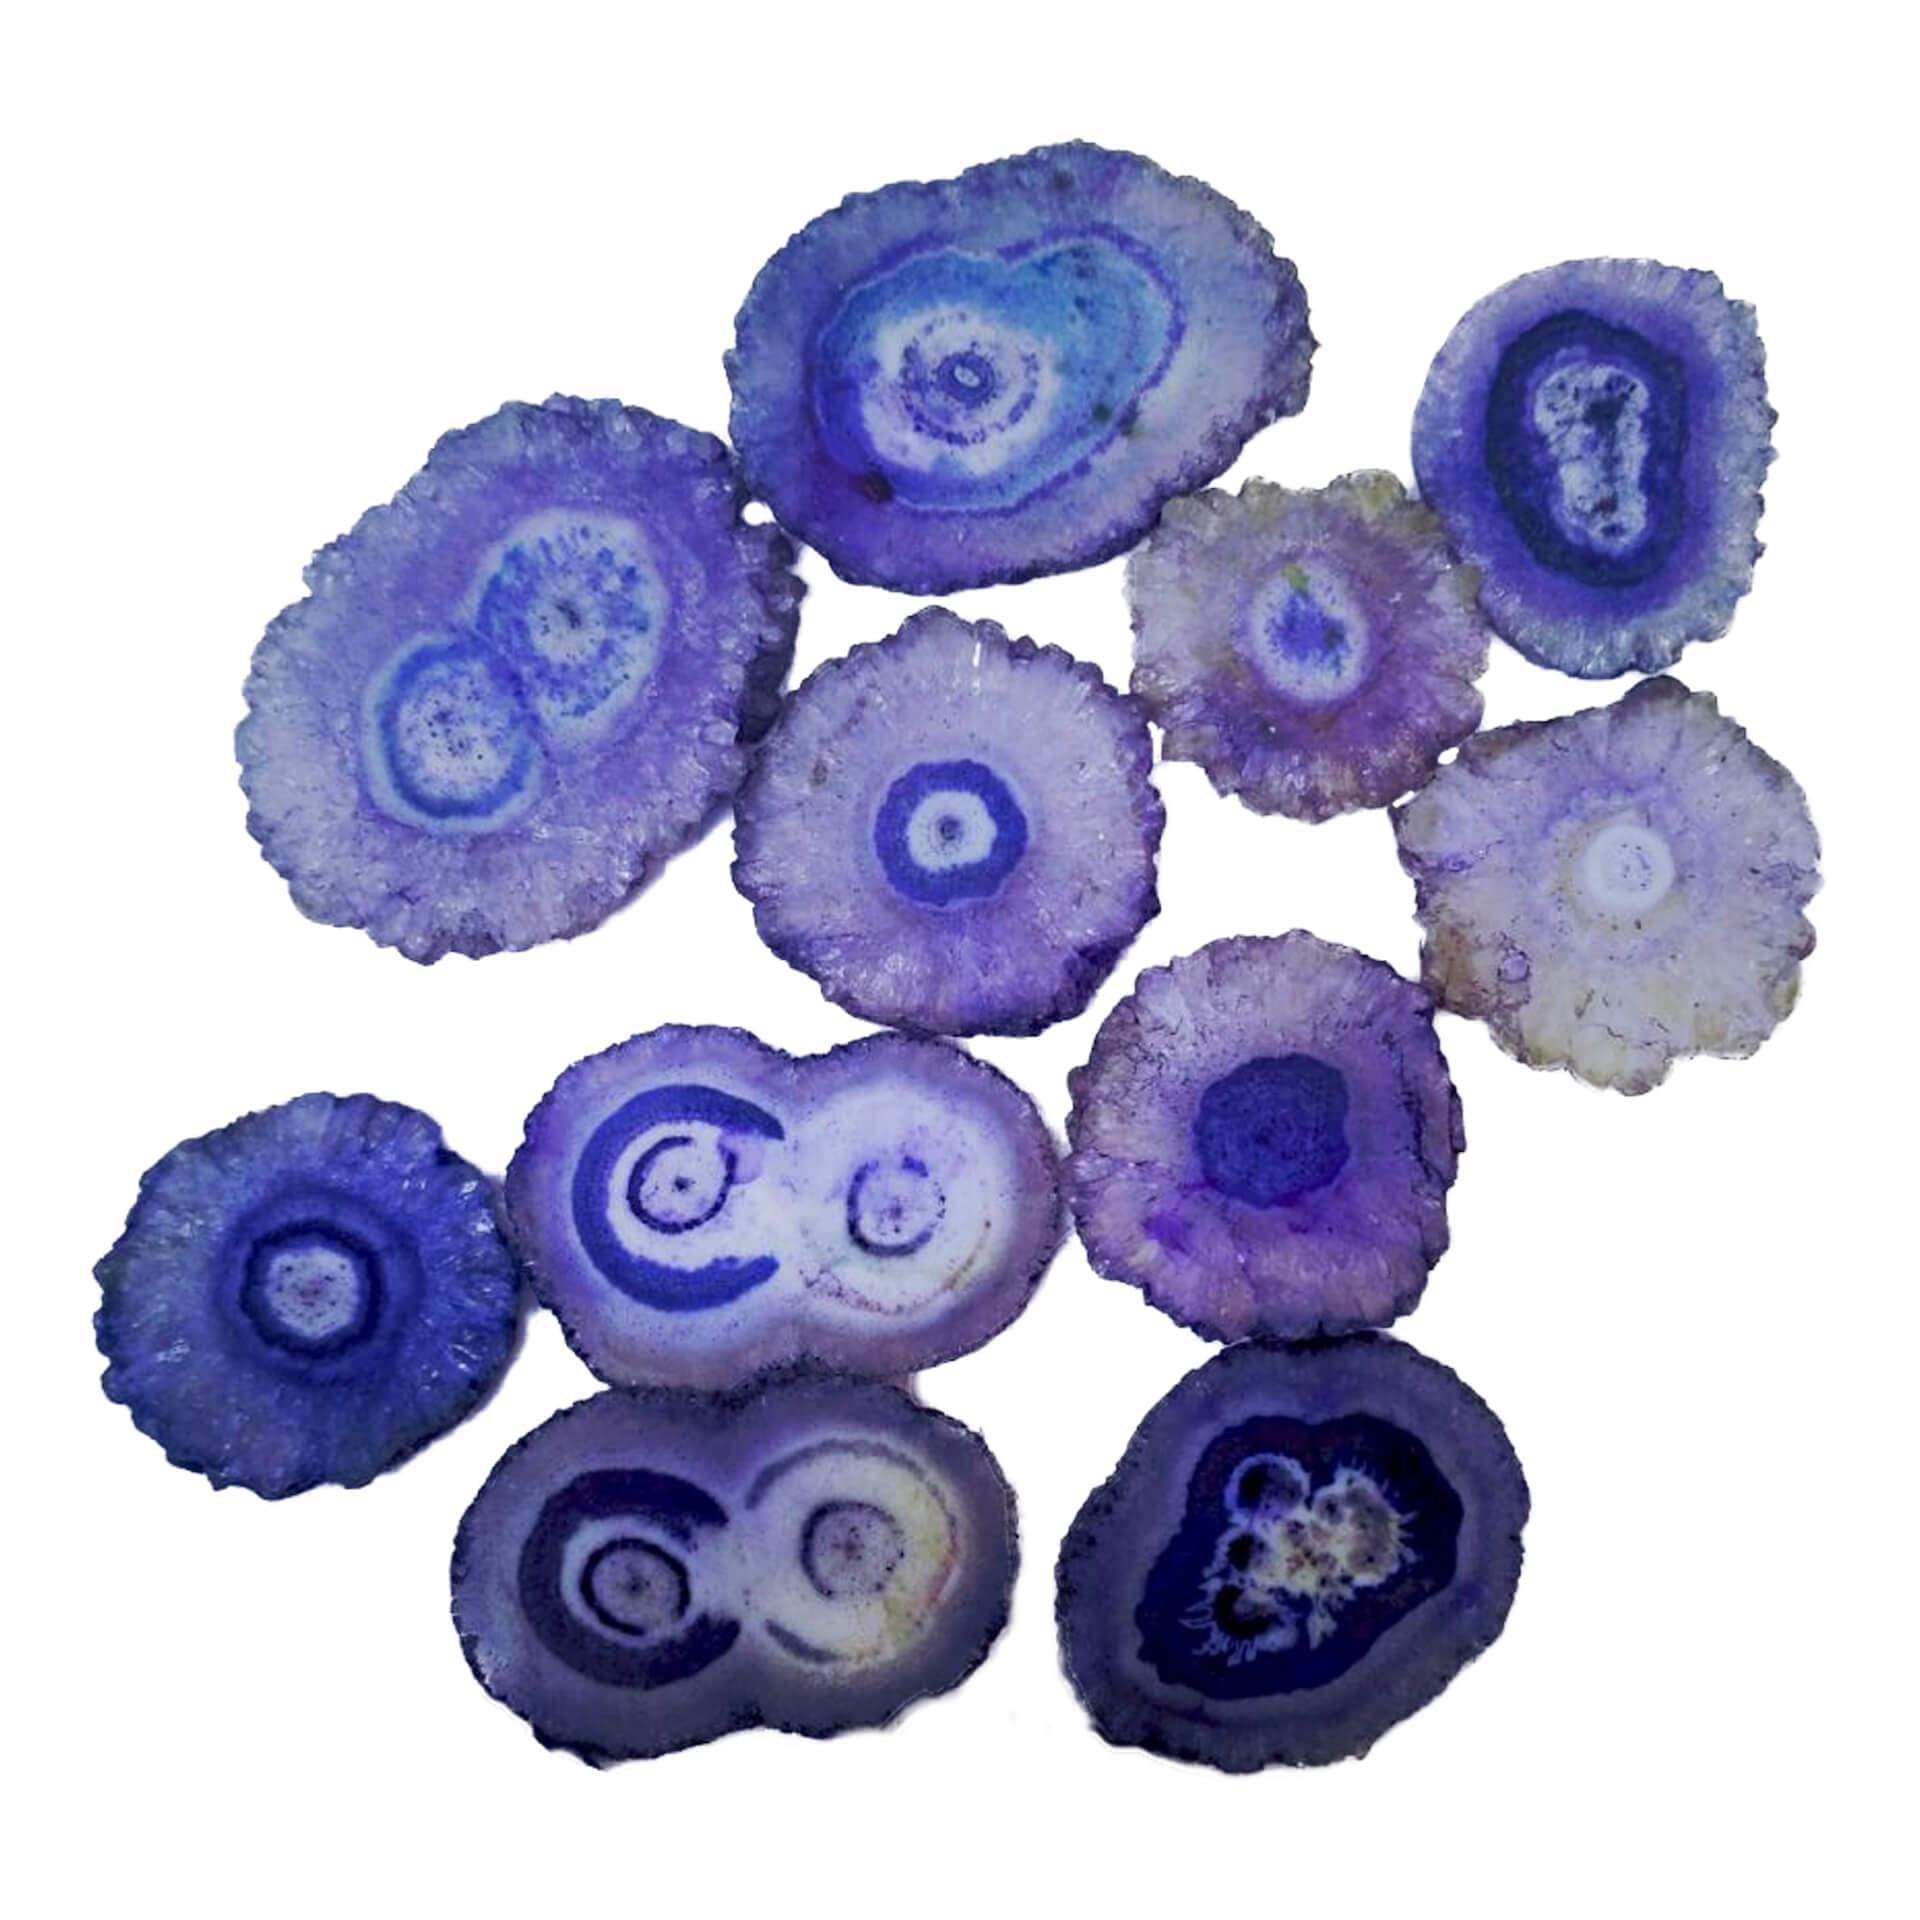 Wholesale Natural Polished Agate Stone Purple Agate Slices